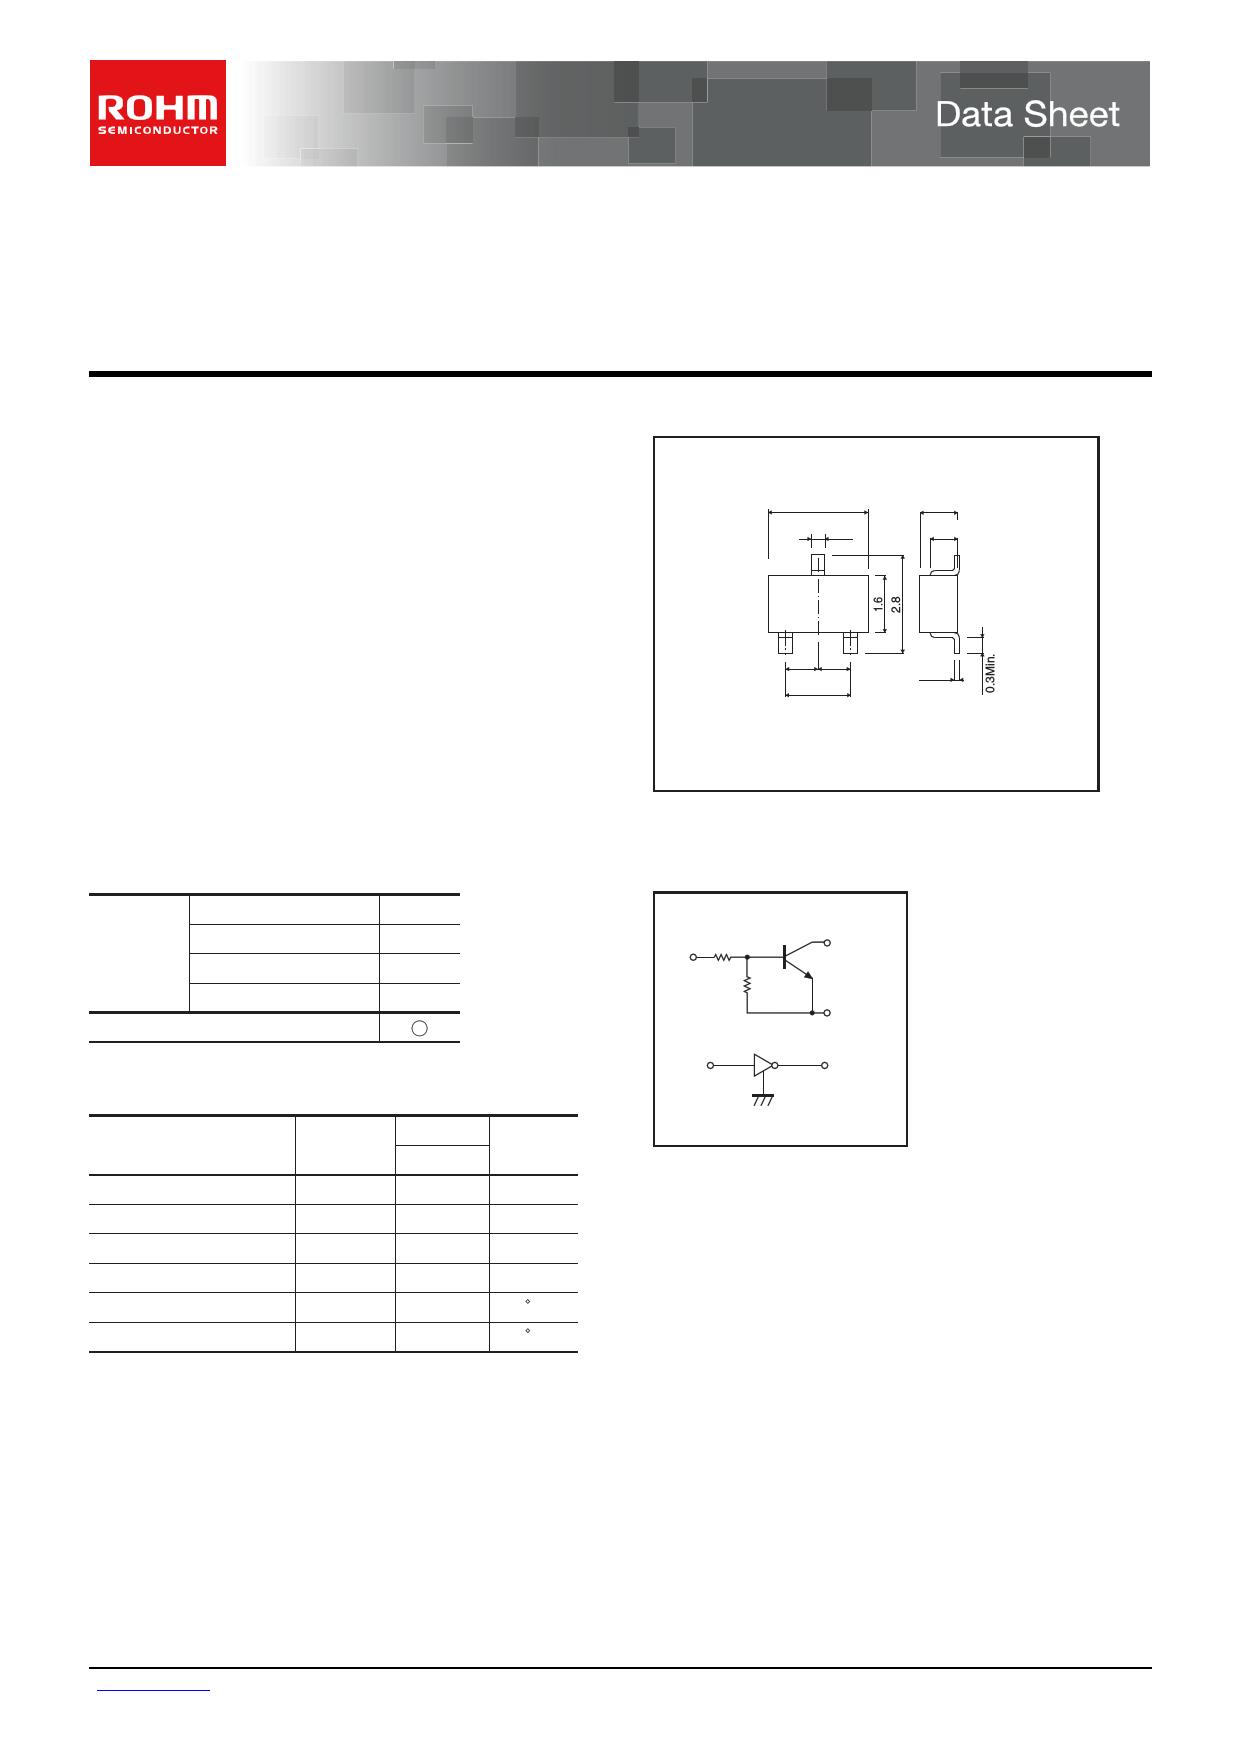 dtd123ek  u30c7 u30fc u30bf u30b7 u30fc u30c8 pdf